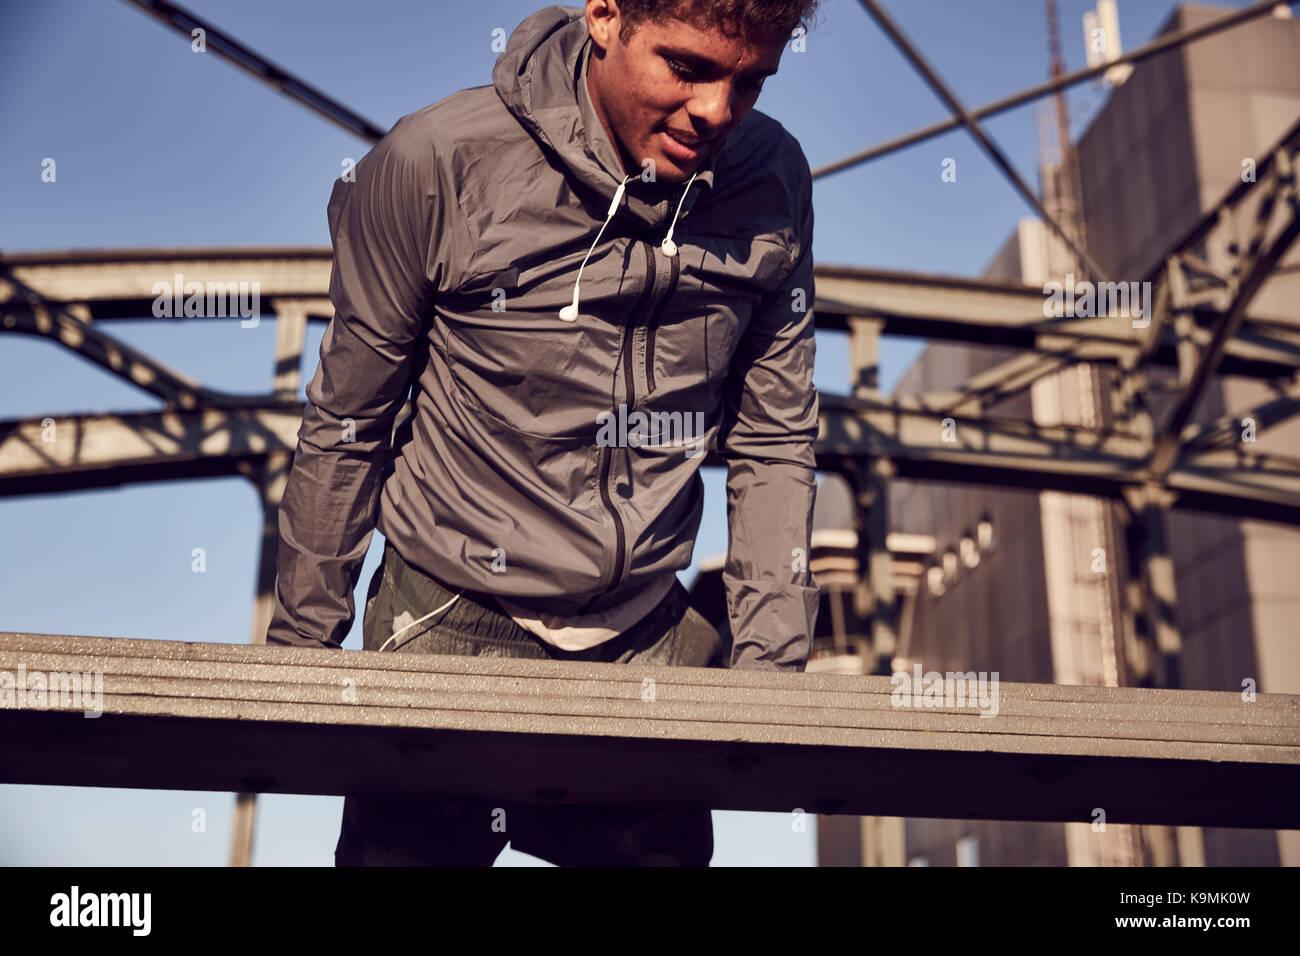 Germany, Munich, Young man training on a bridge - Stock Image